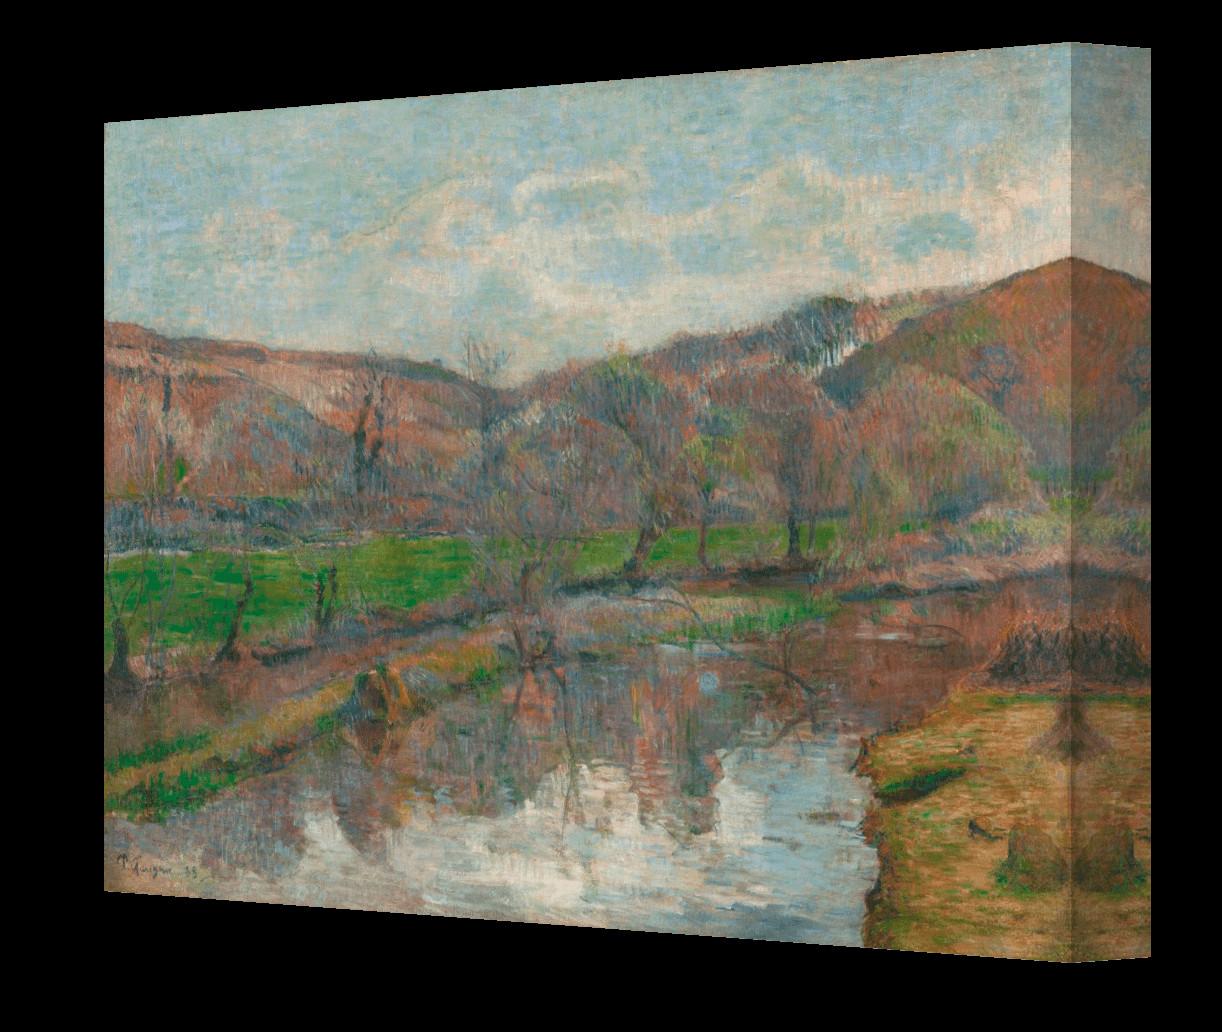 A Vase Of Flowers by Paul Gauguin Of Obraz Ka…pia…cy Sia™ Paul Gauguin Lotari within Obraz Krajobraz Bretanii Paul Gauguin